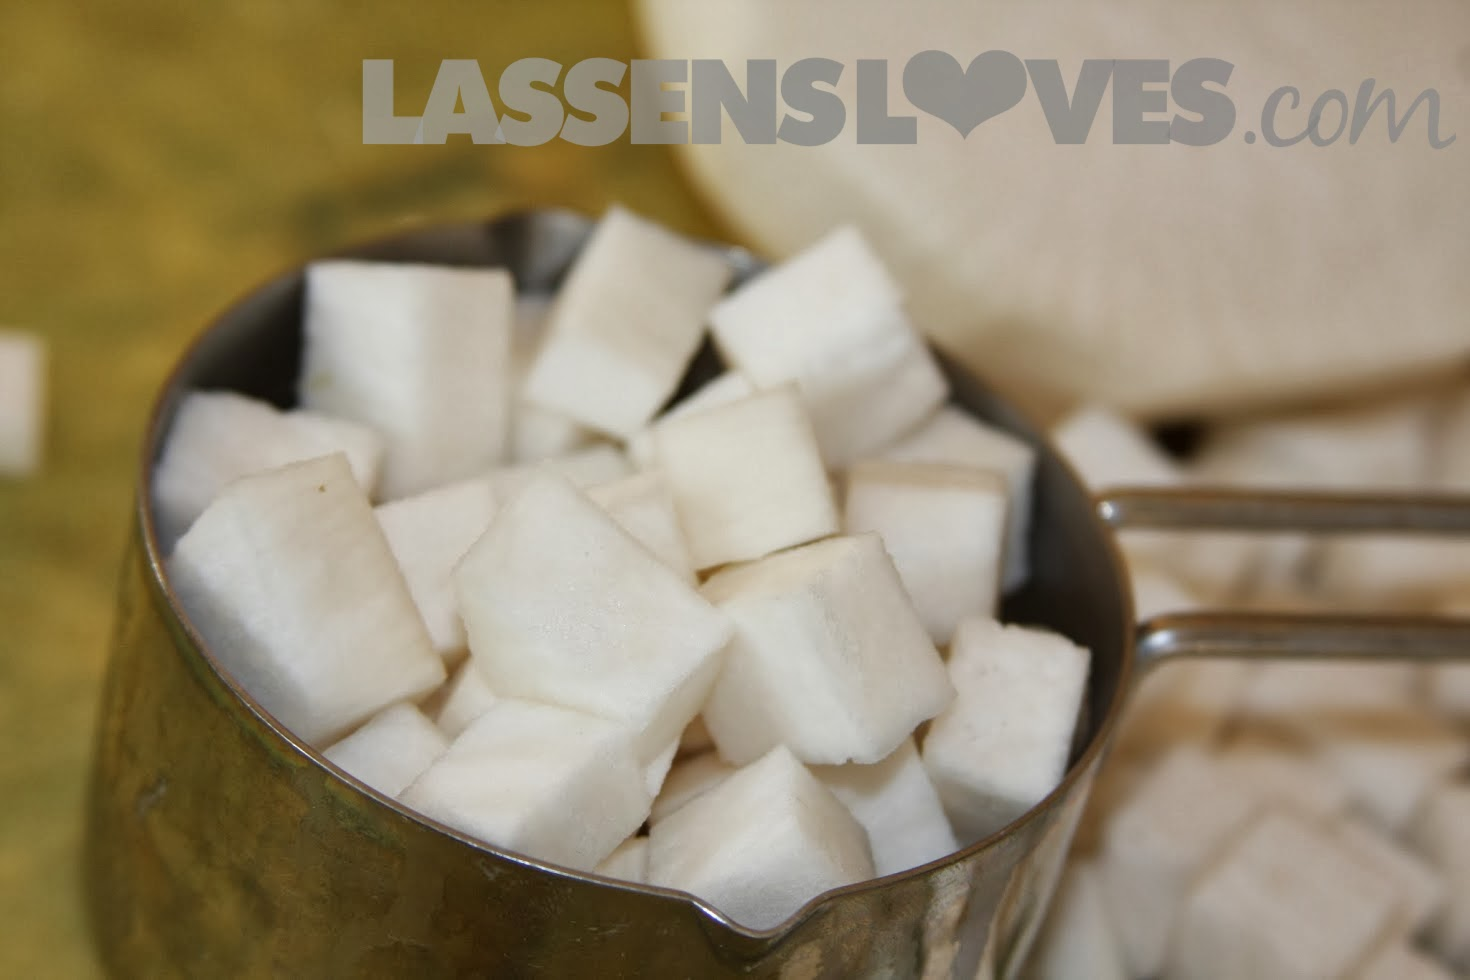 lassensloves.com, Lassen's, Lassens, hemp+seeds, salad+recipe